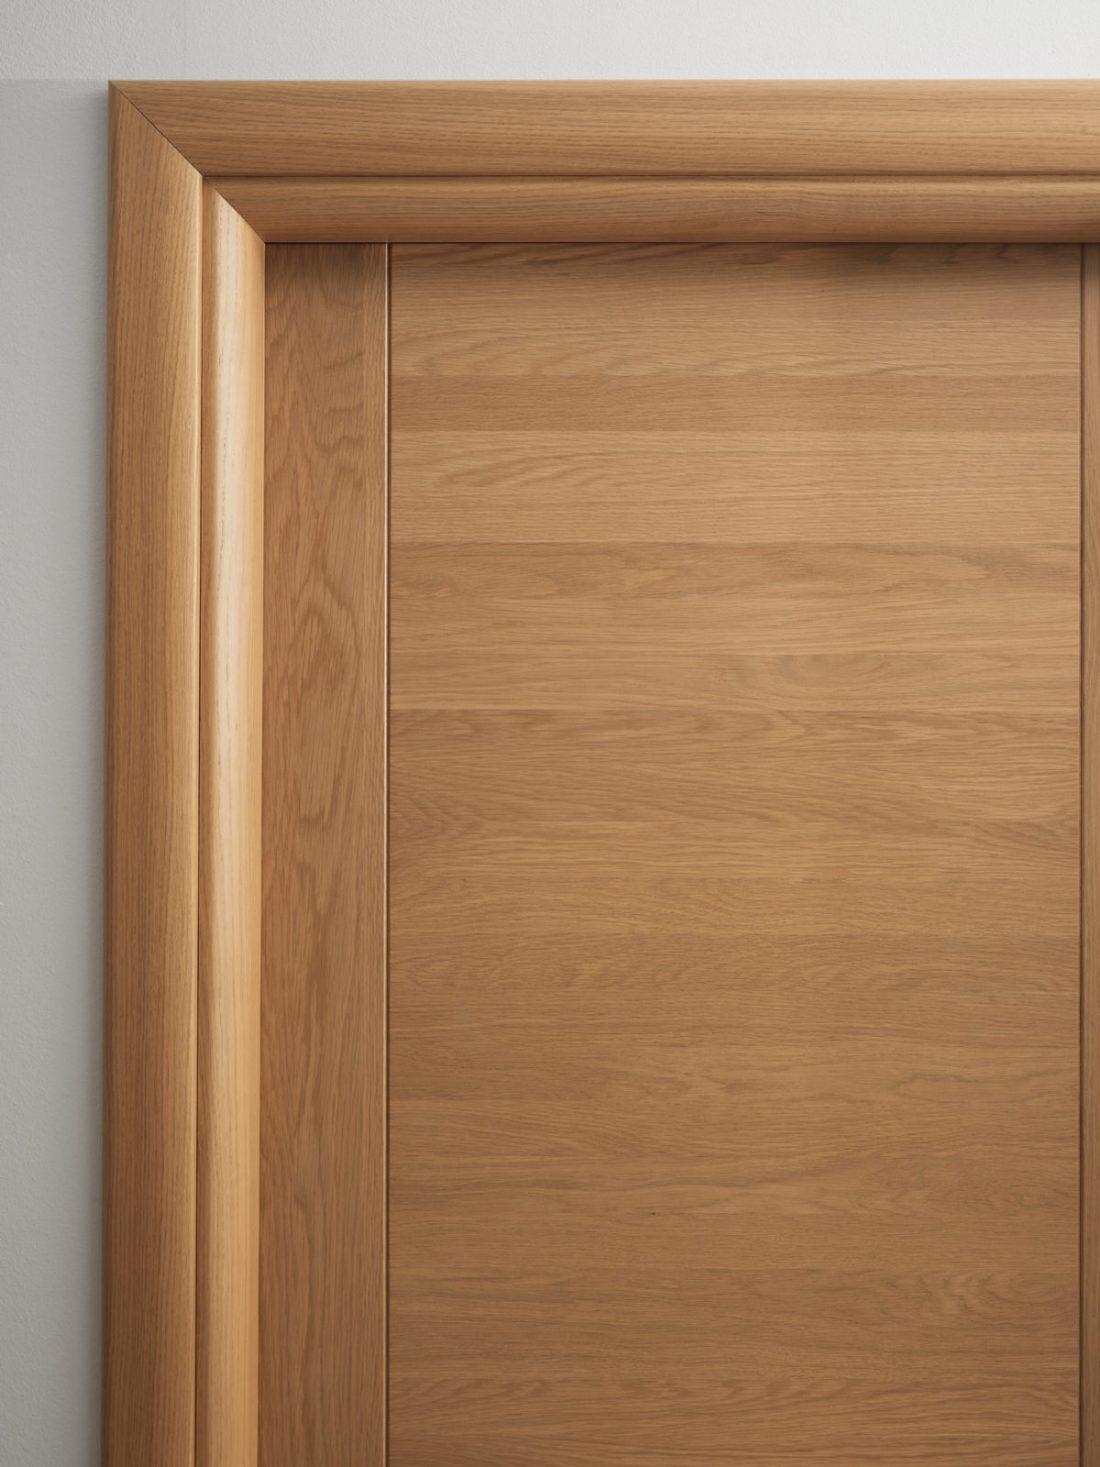 Porta legno pangea garofoli - Garofoli